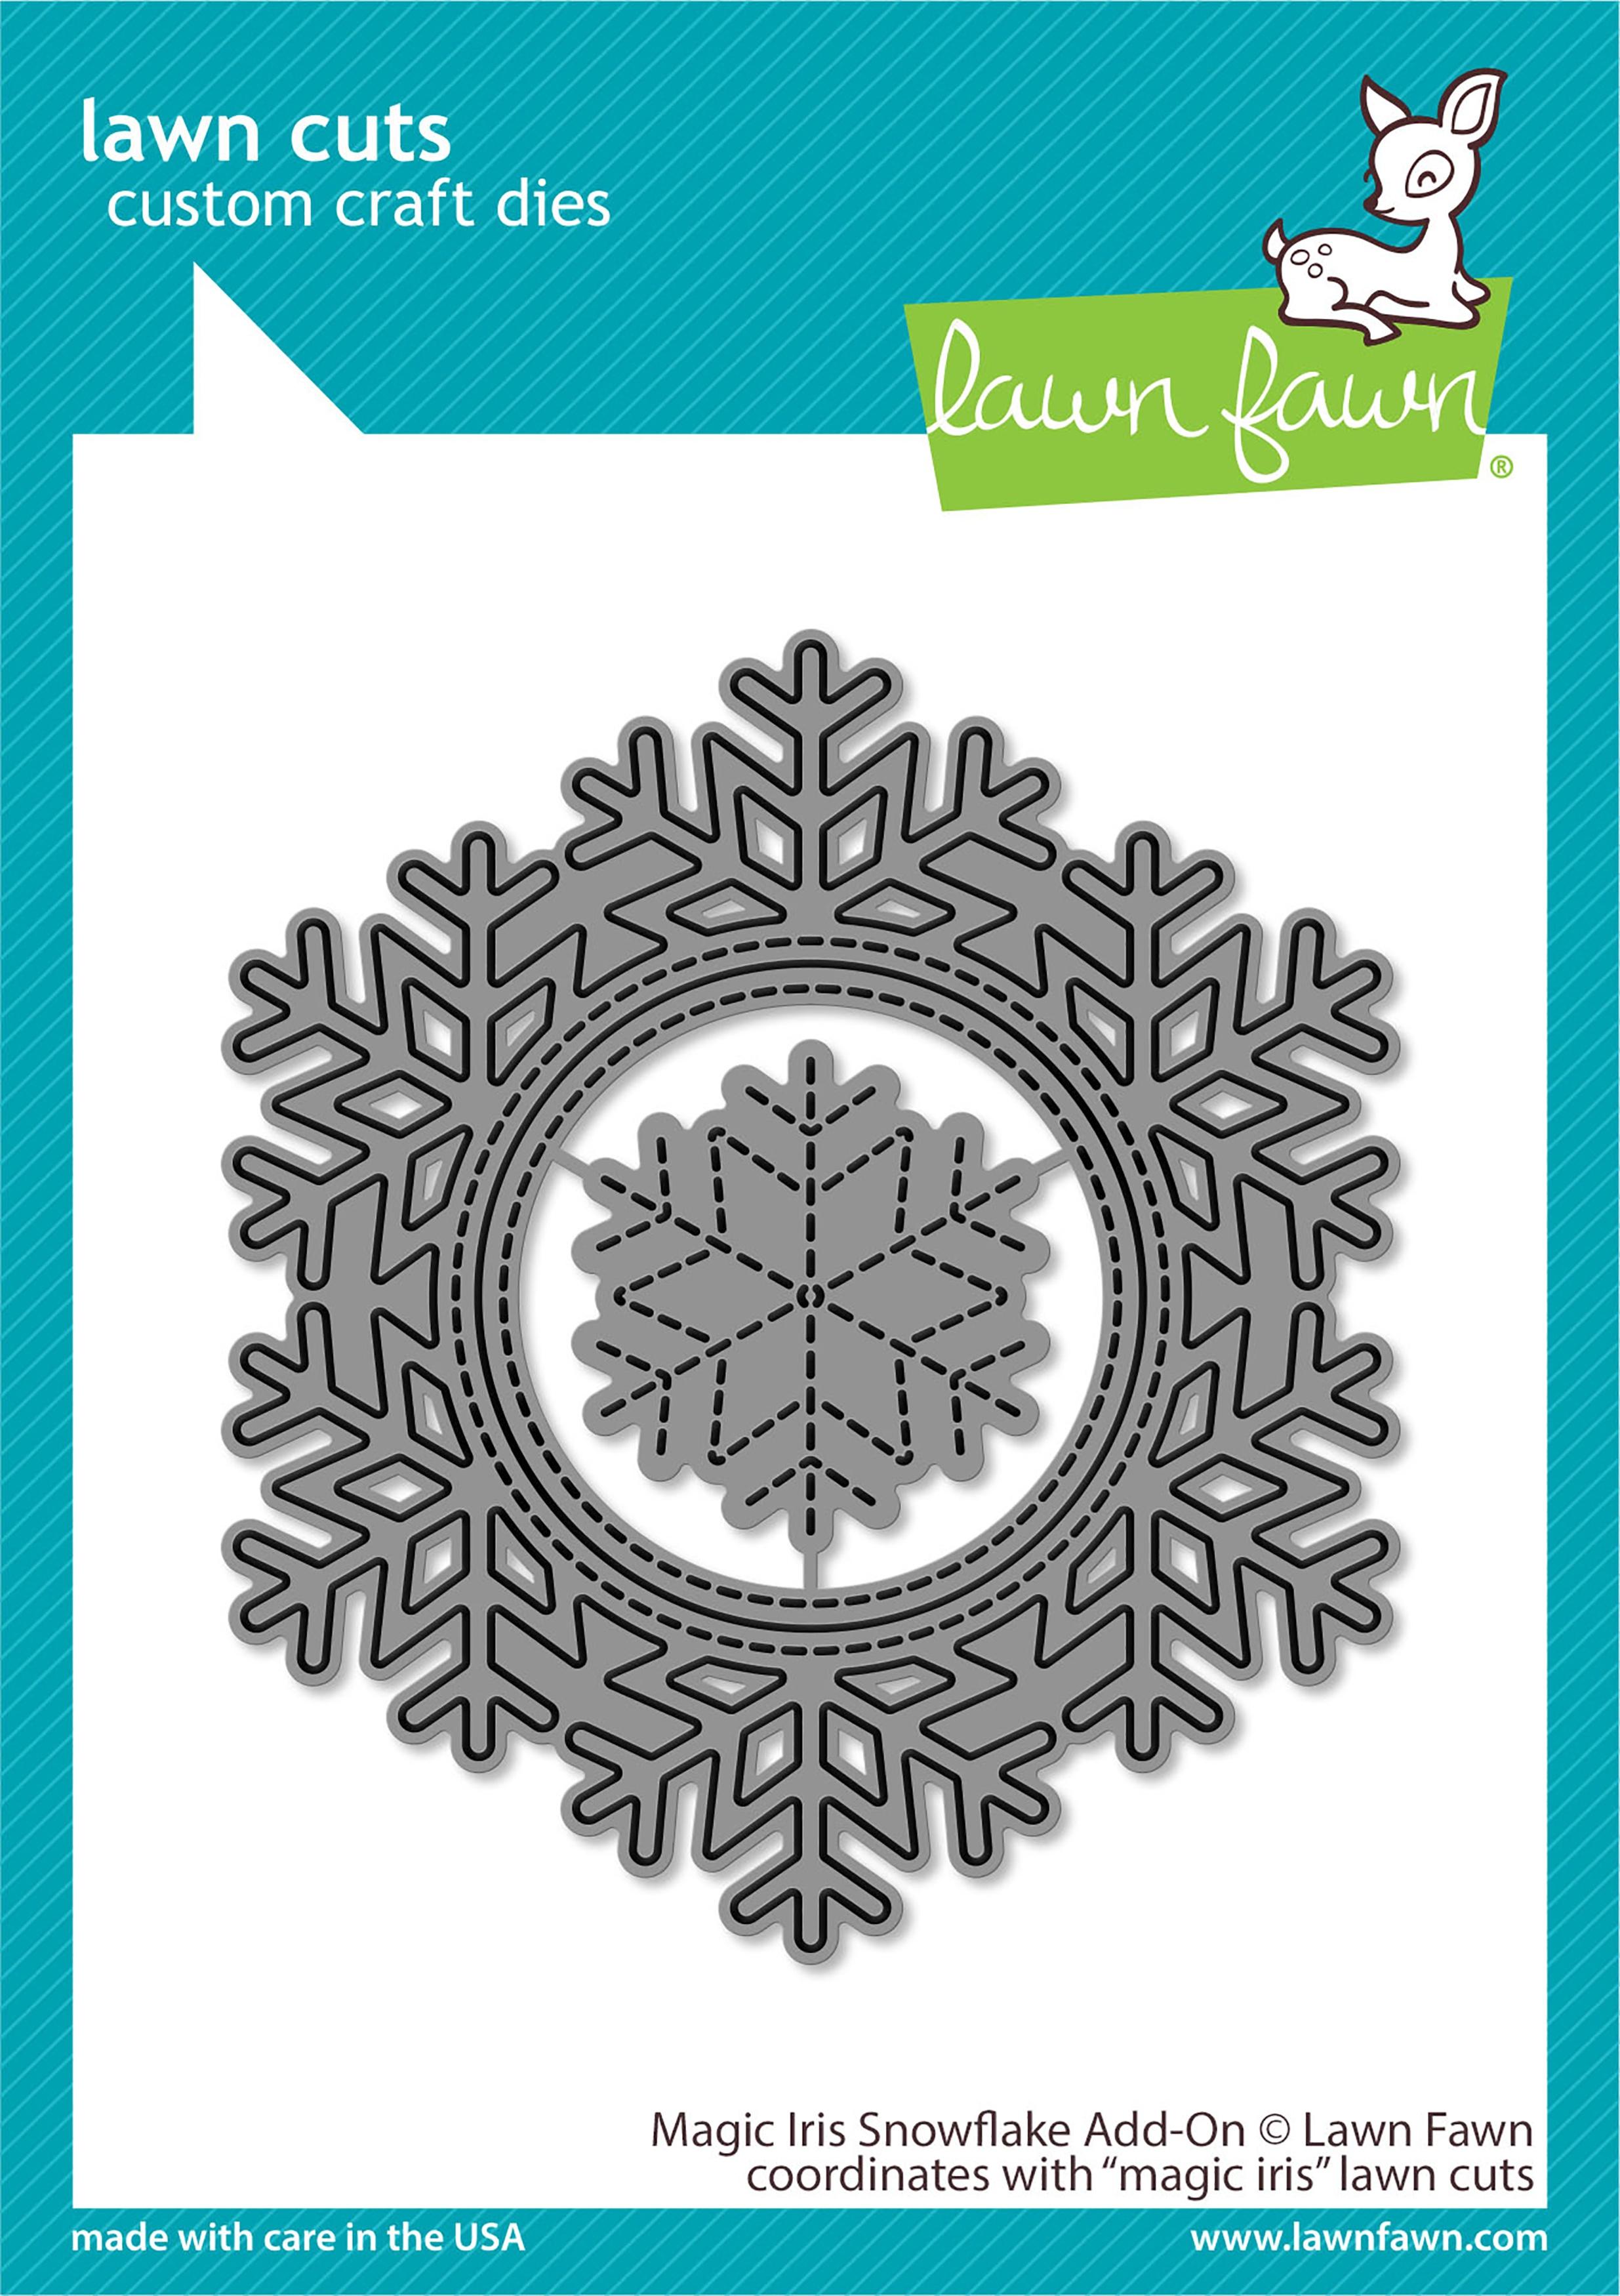 Lawn Cuts Custom Craft Die-Magic Iris Snowflake Add-On